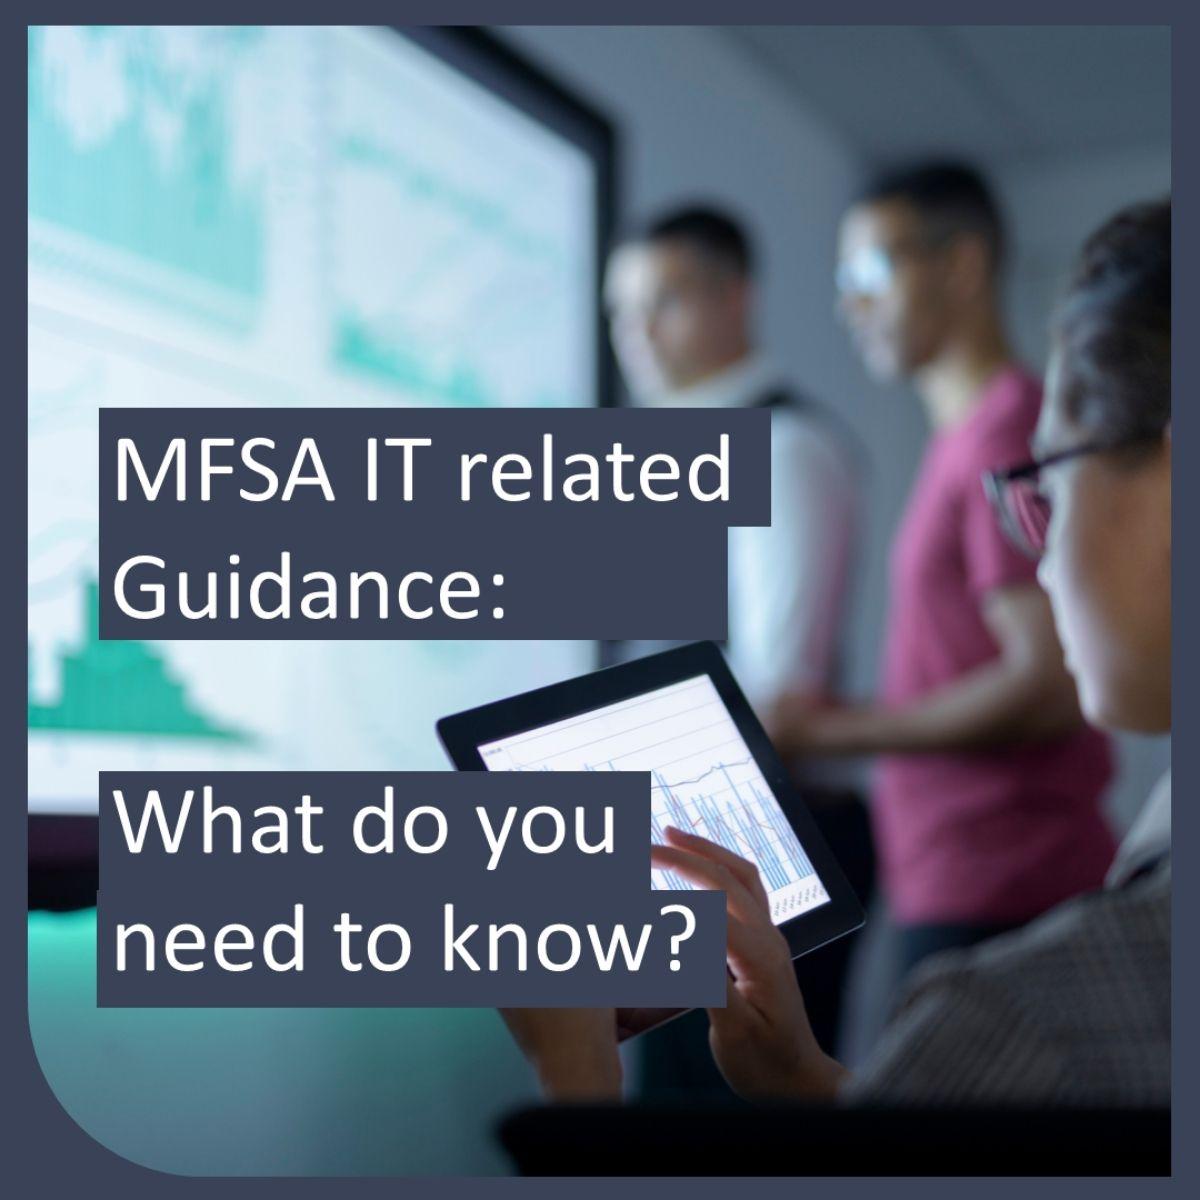 MFSA: Guidance on IT related Arrangements